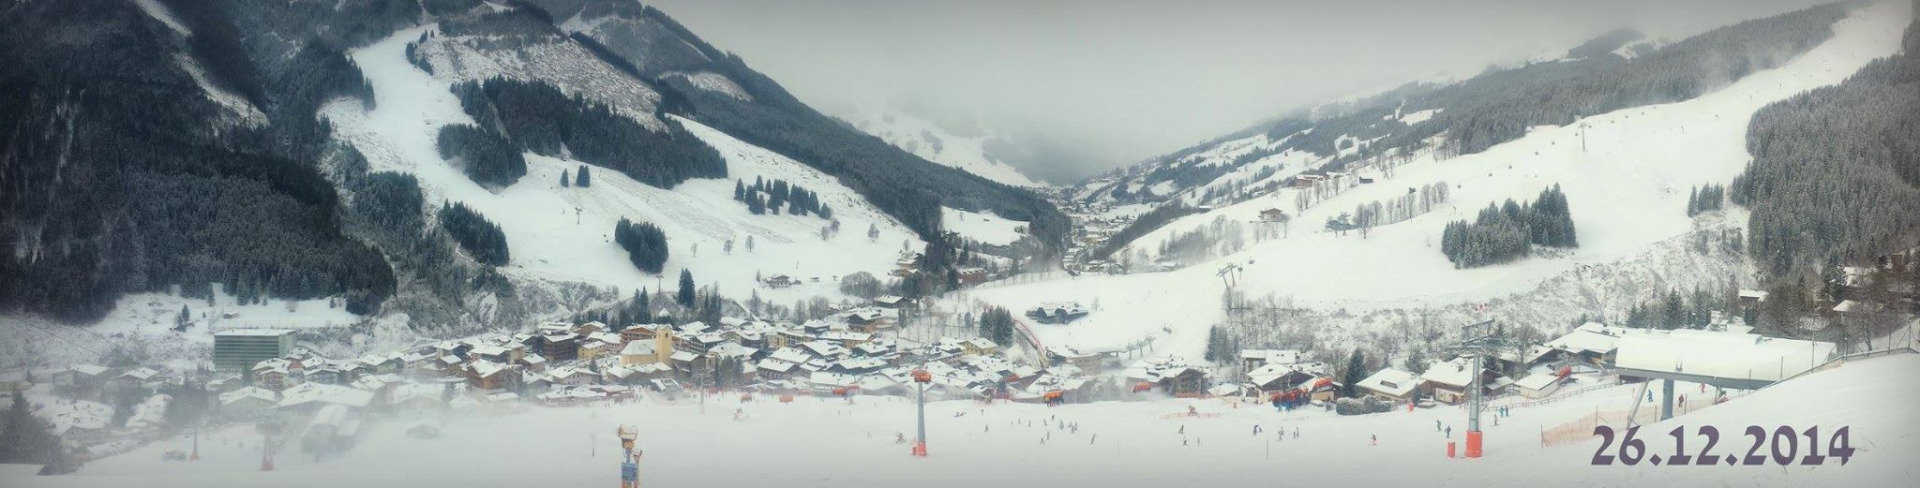 Saalbach-Hinterglemm Dec. 26, 2014